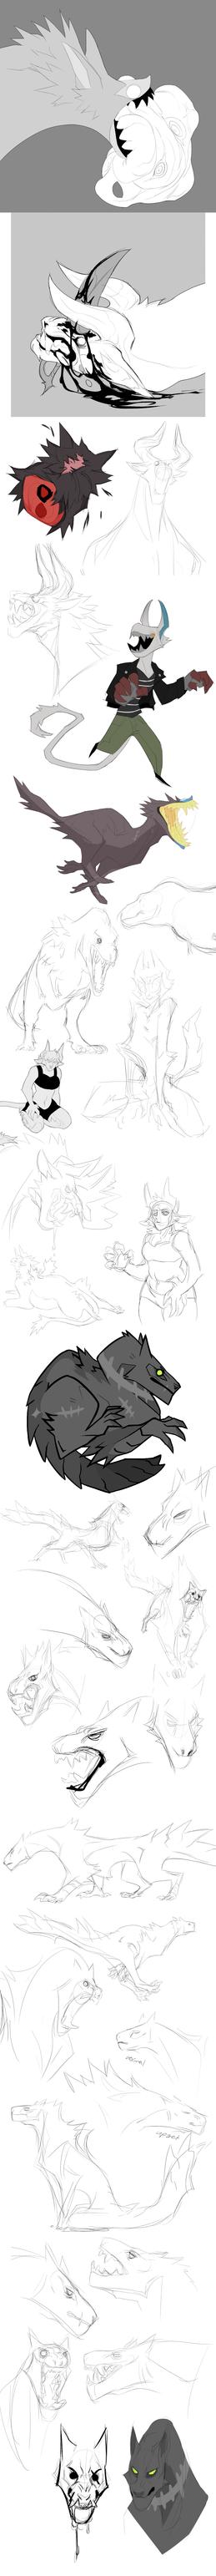 Sketch Dump no.25 by Dusty-Demon